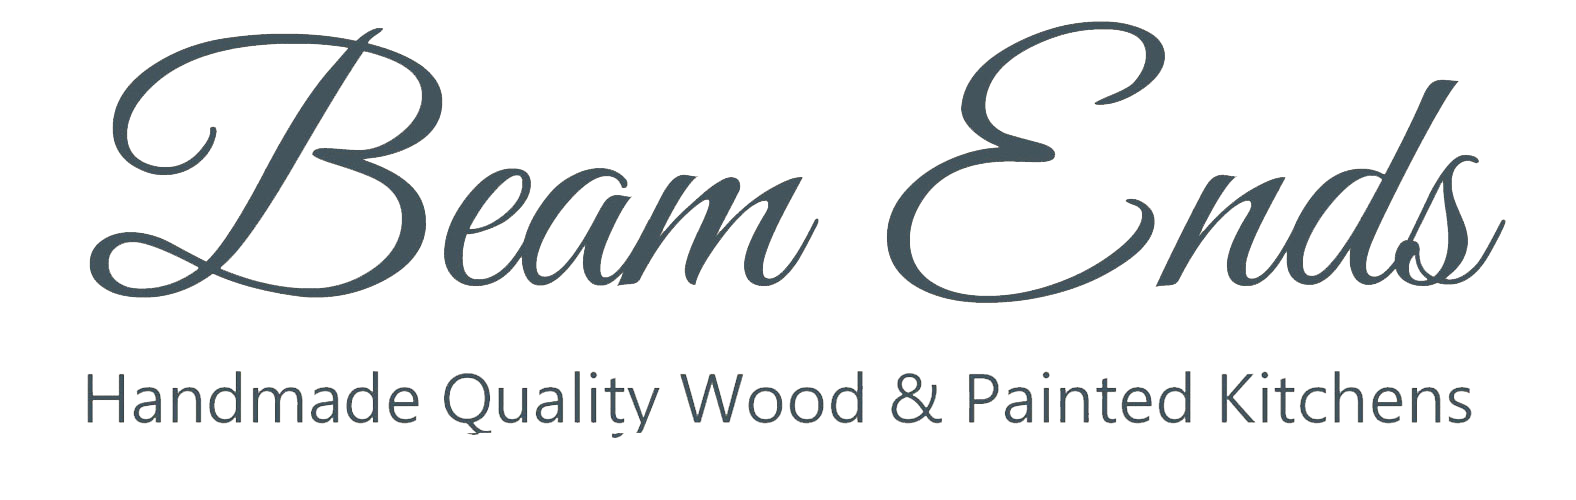 Beam Ends Kitchens - bespoke kitchens handmade in Norfolk/Norwich